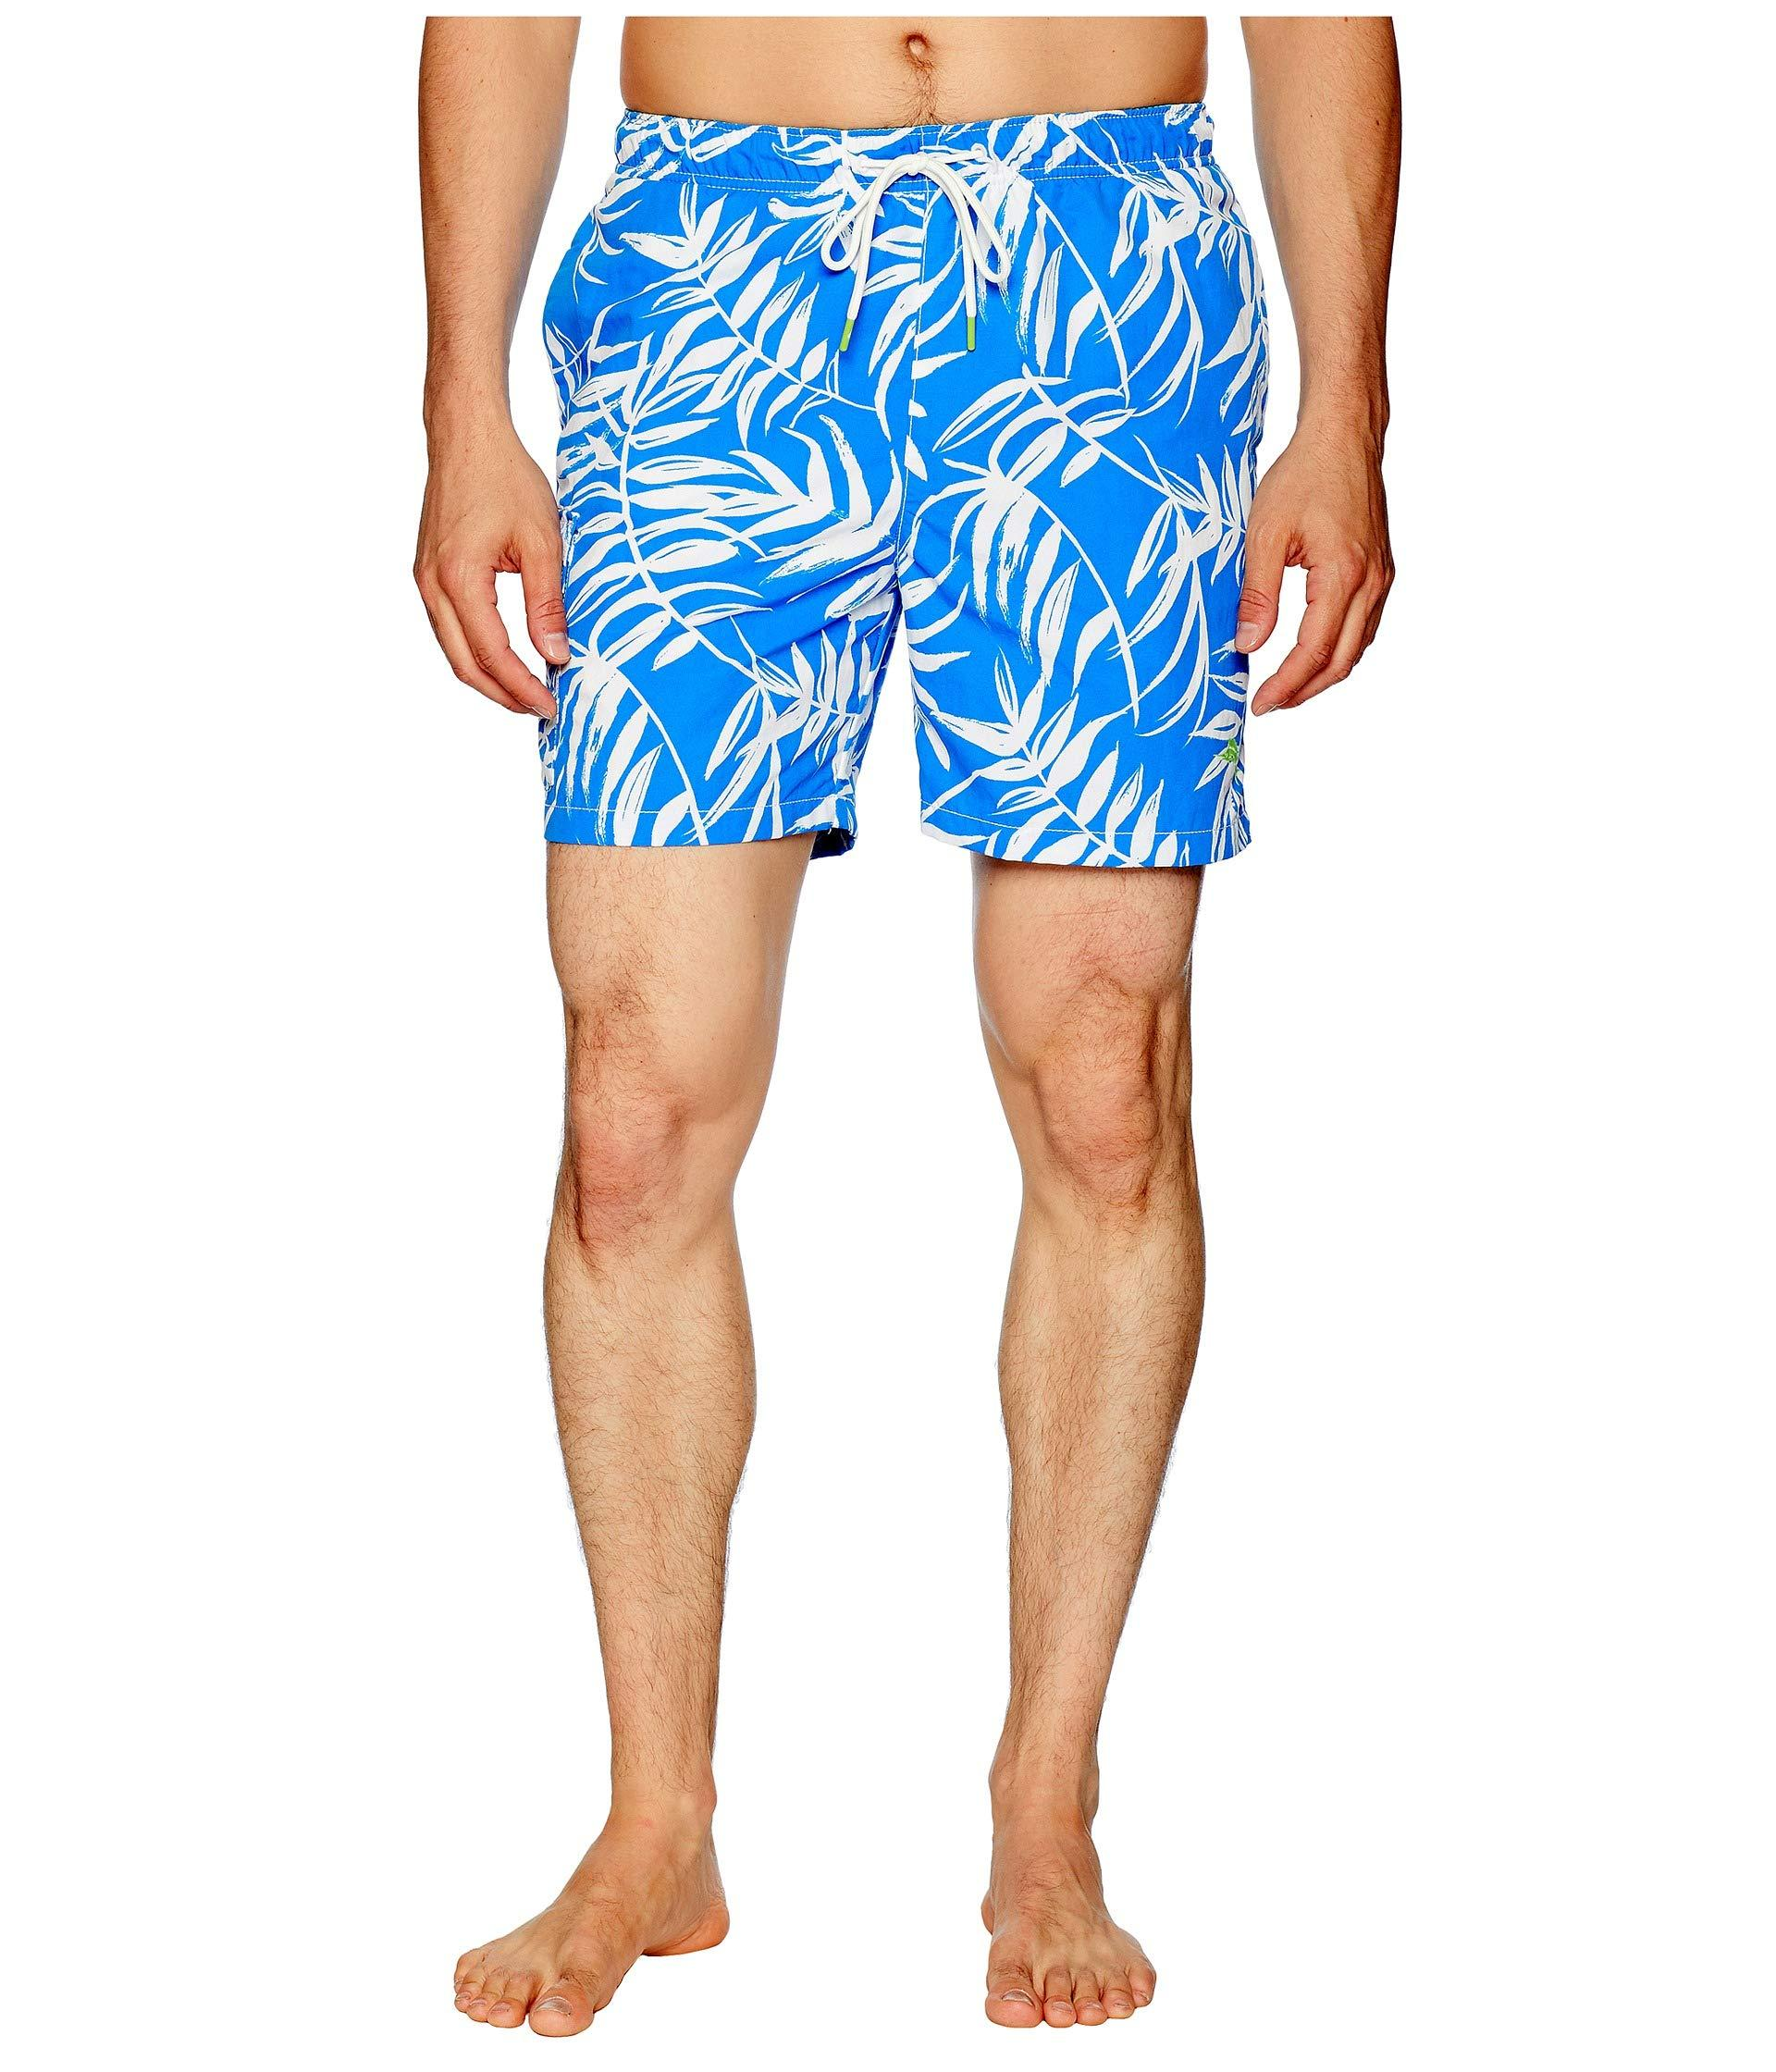 353308d19d Lyst - Tommy Bahama Naples Muy Caliente Swim Trunk in Blue for Men ...